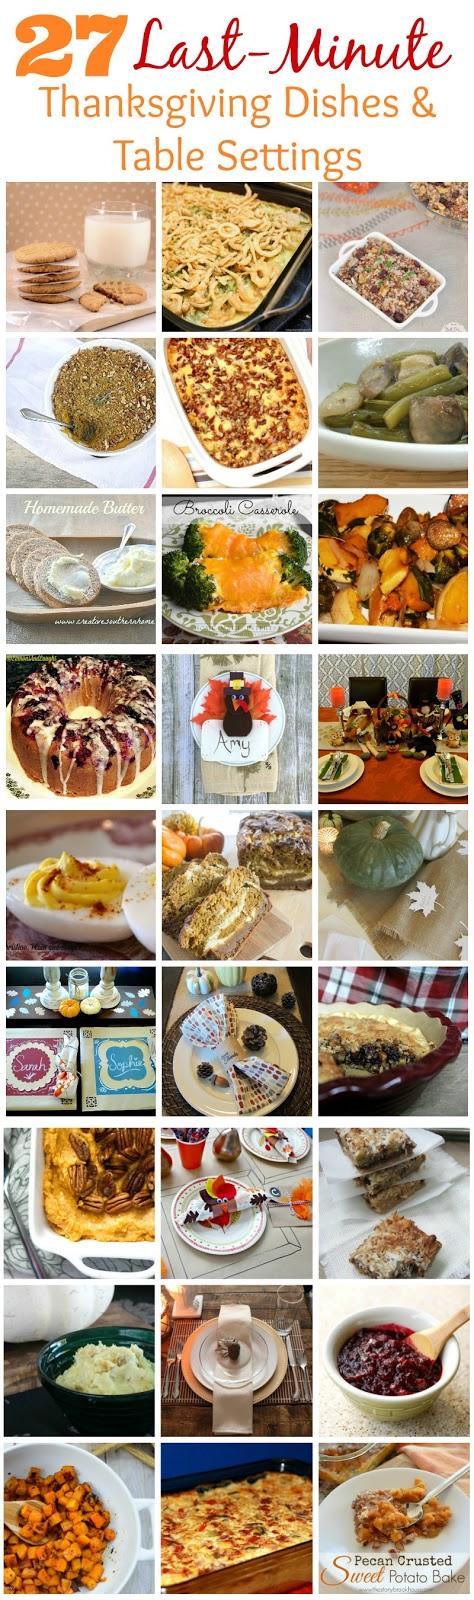 27 Last Minute Thanksgiving Dishes & Table Settings pitterandglink.com